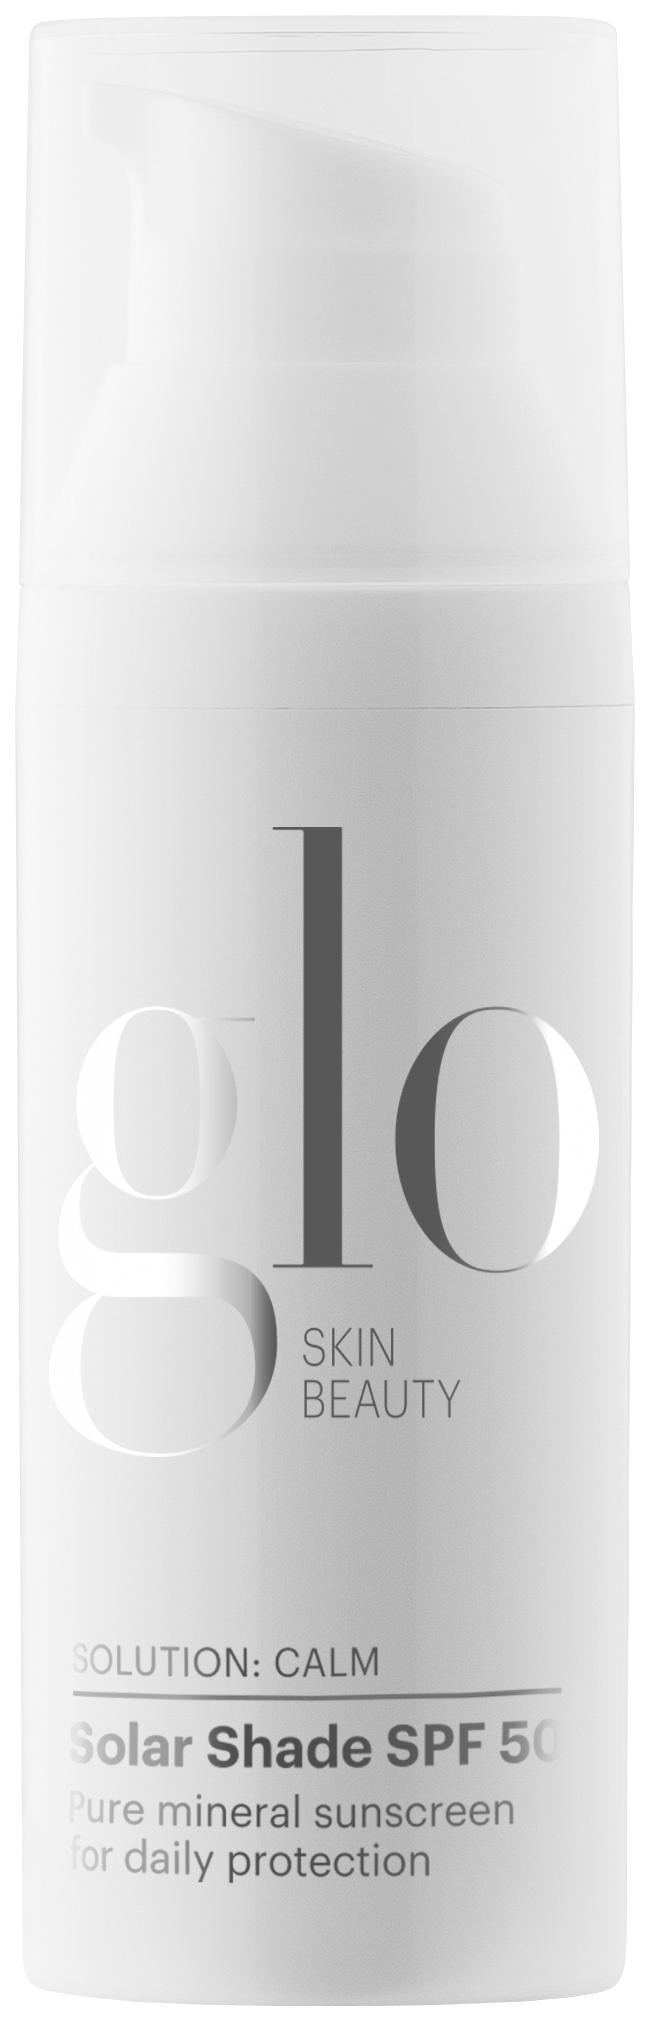 Солнцезащитный крем Glo Skin Beauty Solar Shade